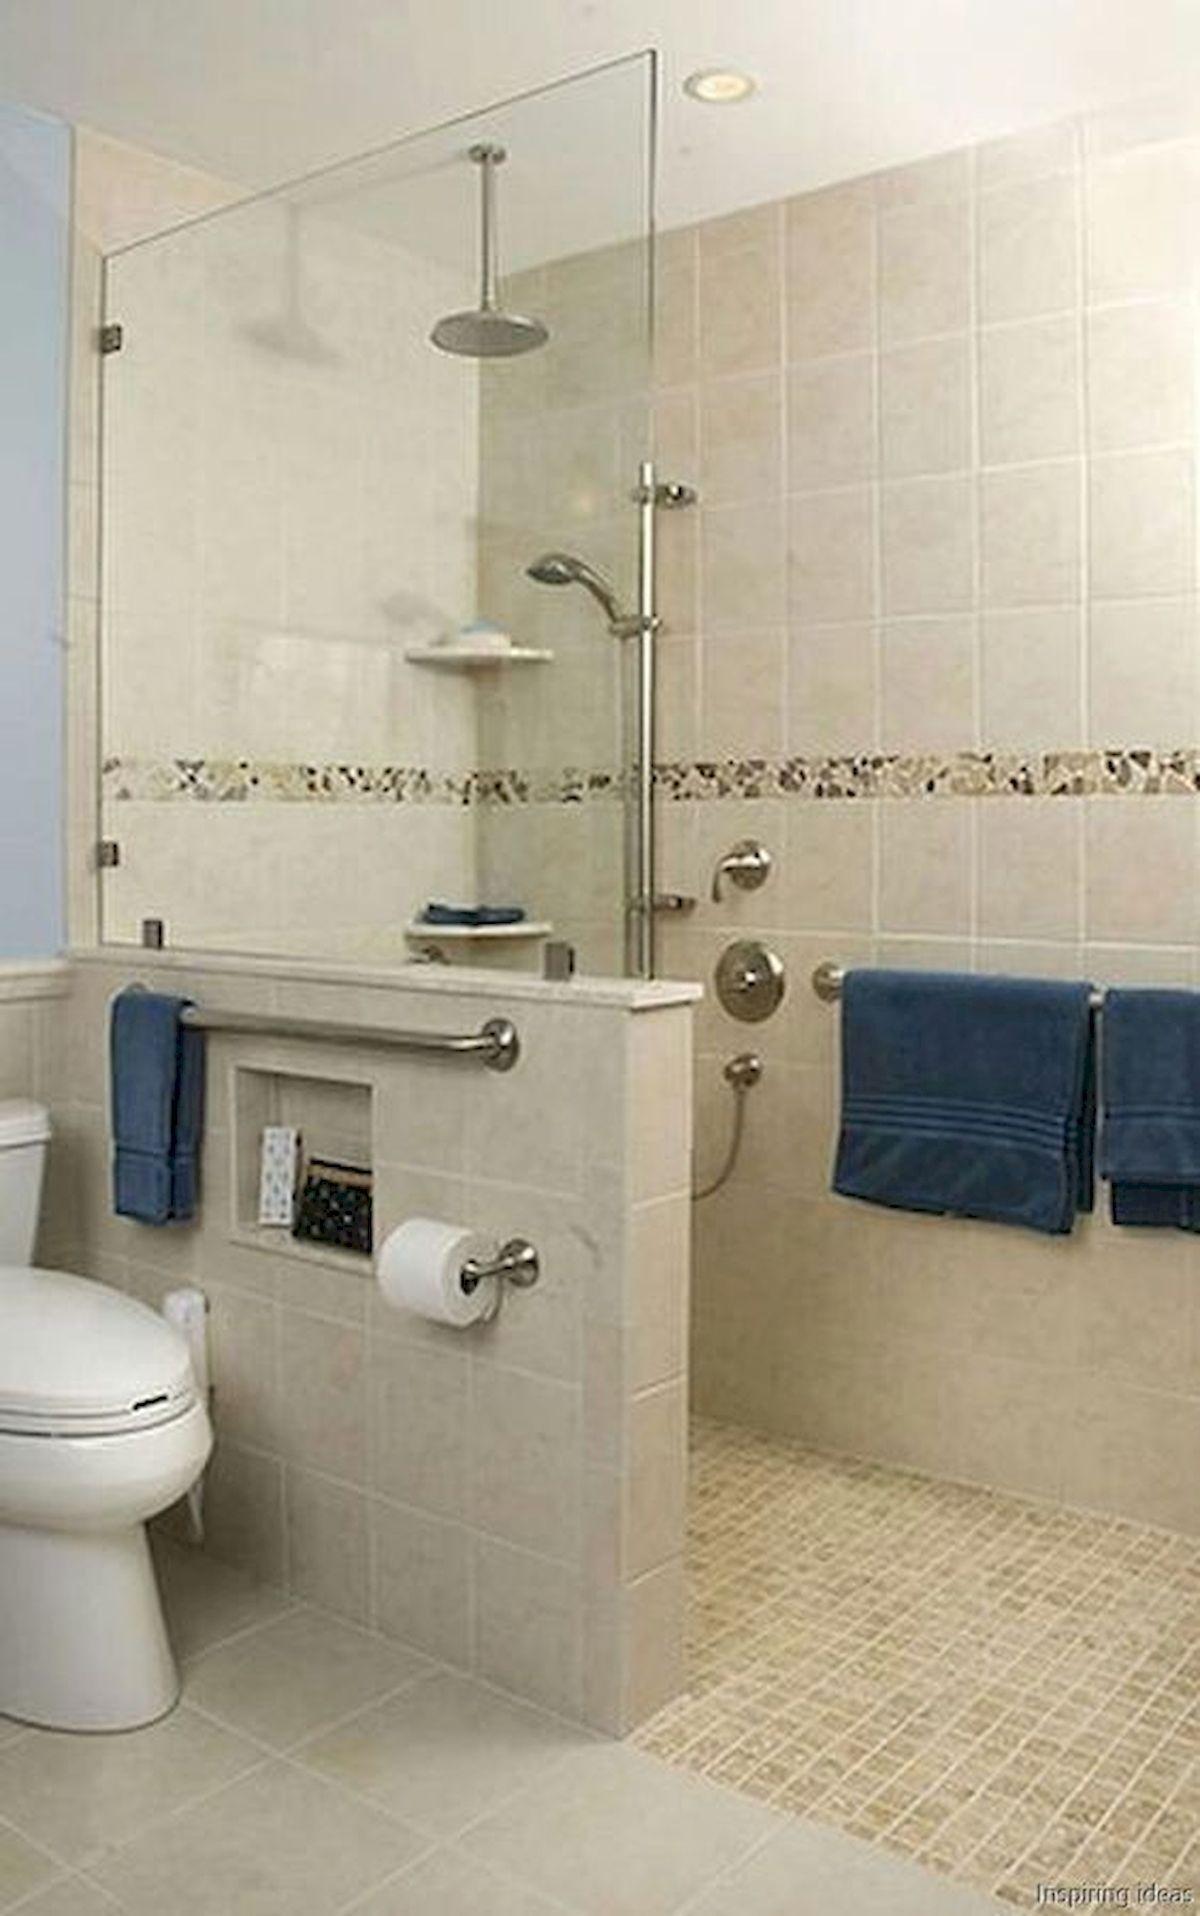 33 Terrific Small Primary Bathroom Ideas 2020 Photos Small Master Bathroom Industrial Shower Doors Master Bathroom